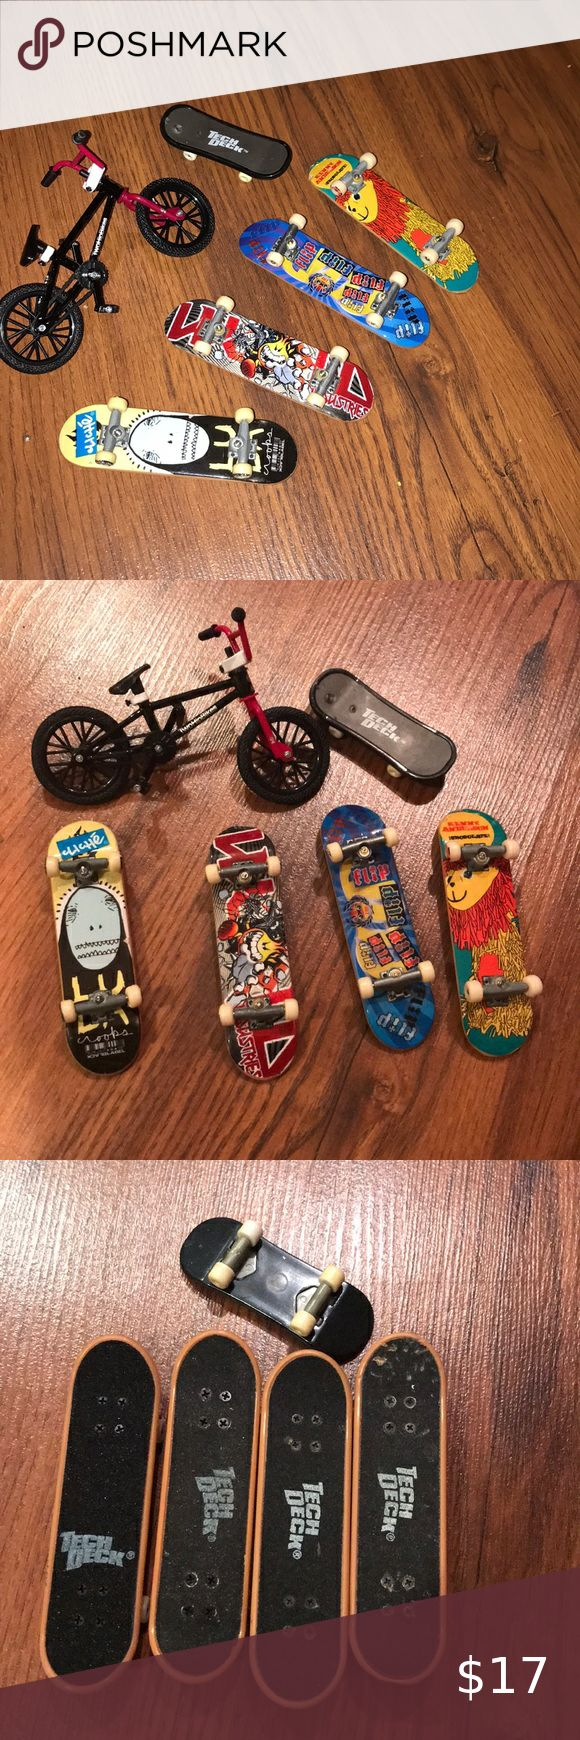 Tech Deck kids mini skateboard pack in 2020 Tech deck